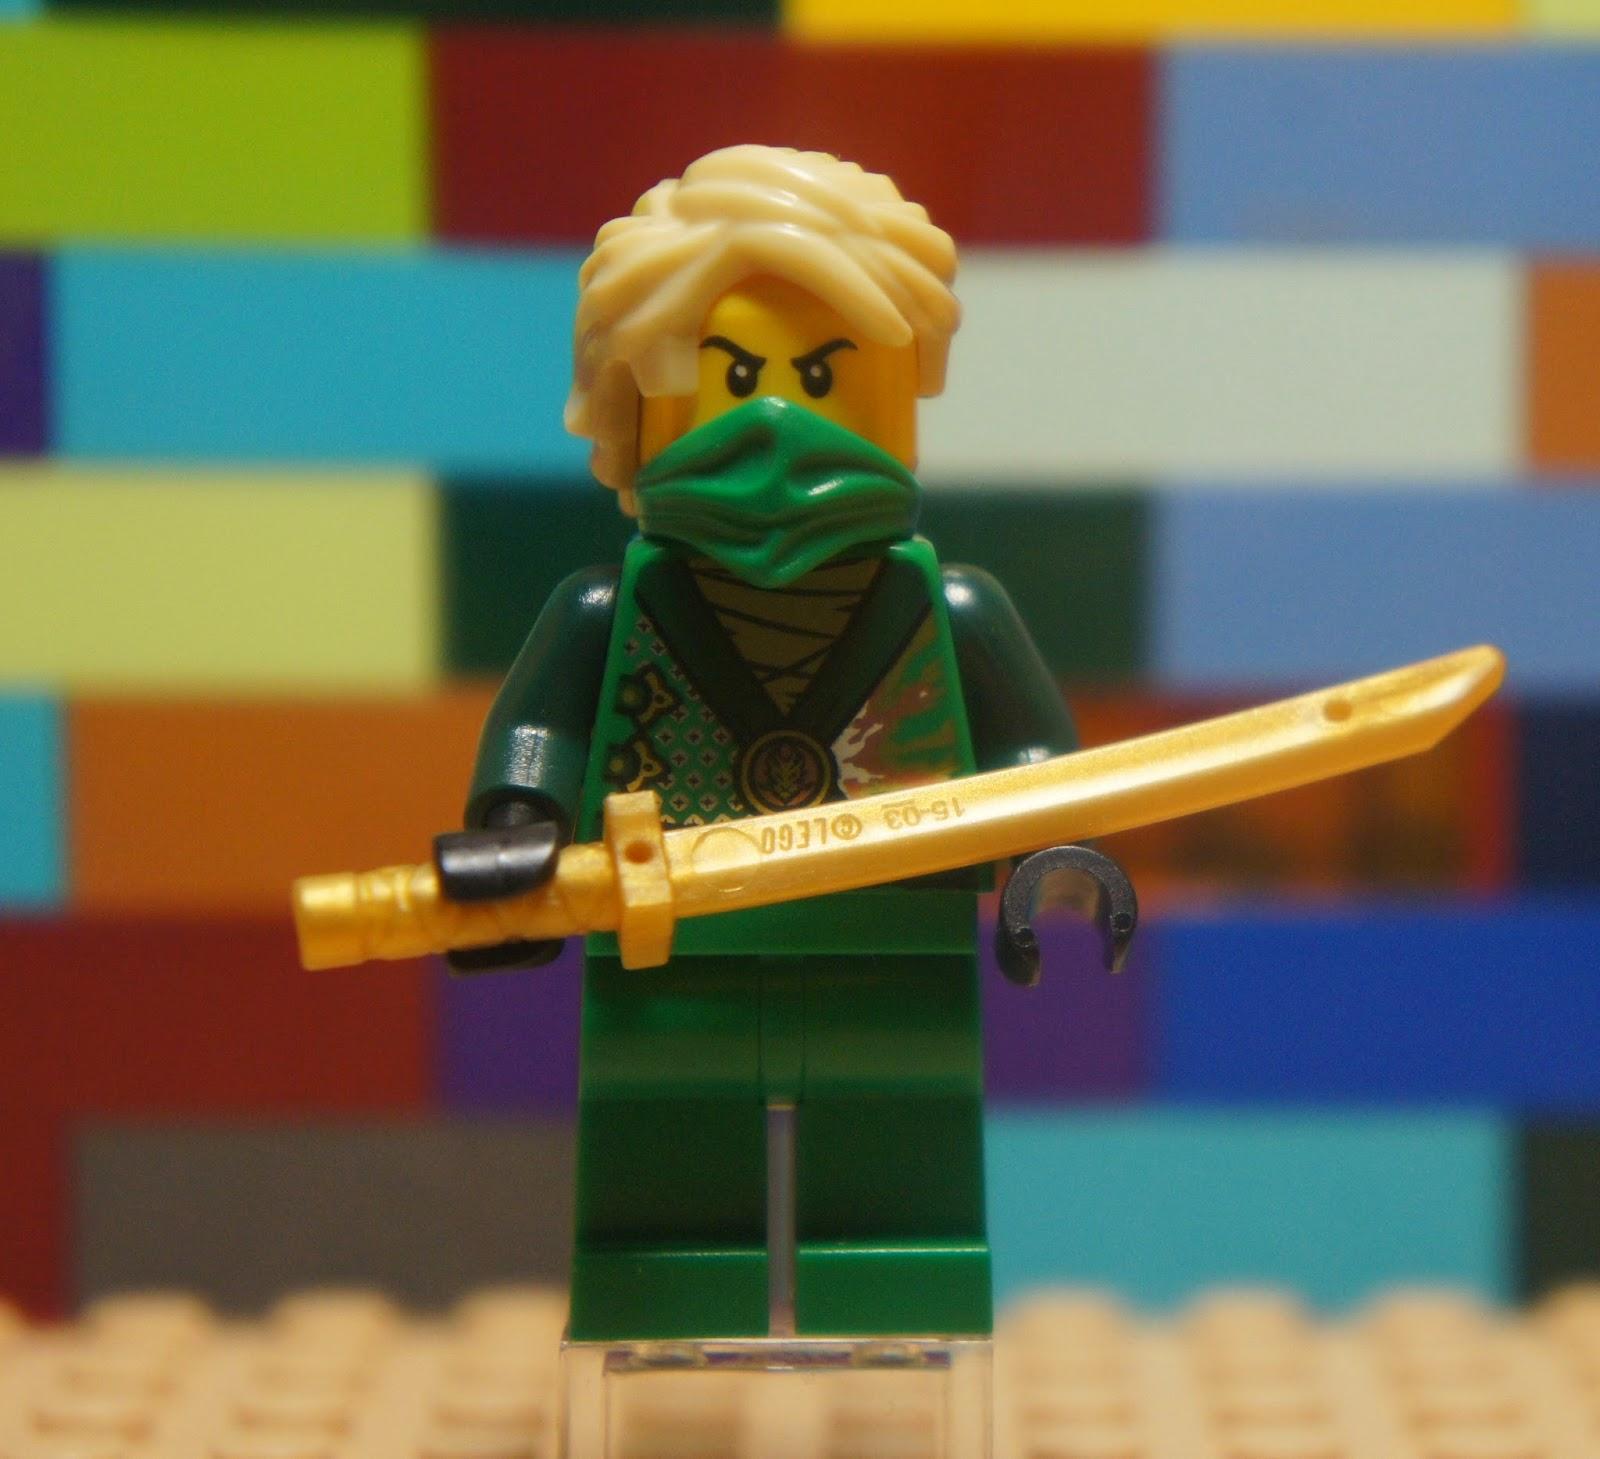 LEGO NJO097 Ninjago Rebooted LLOYD GARMADON Samurai Weapon Minifigure